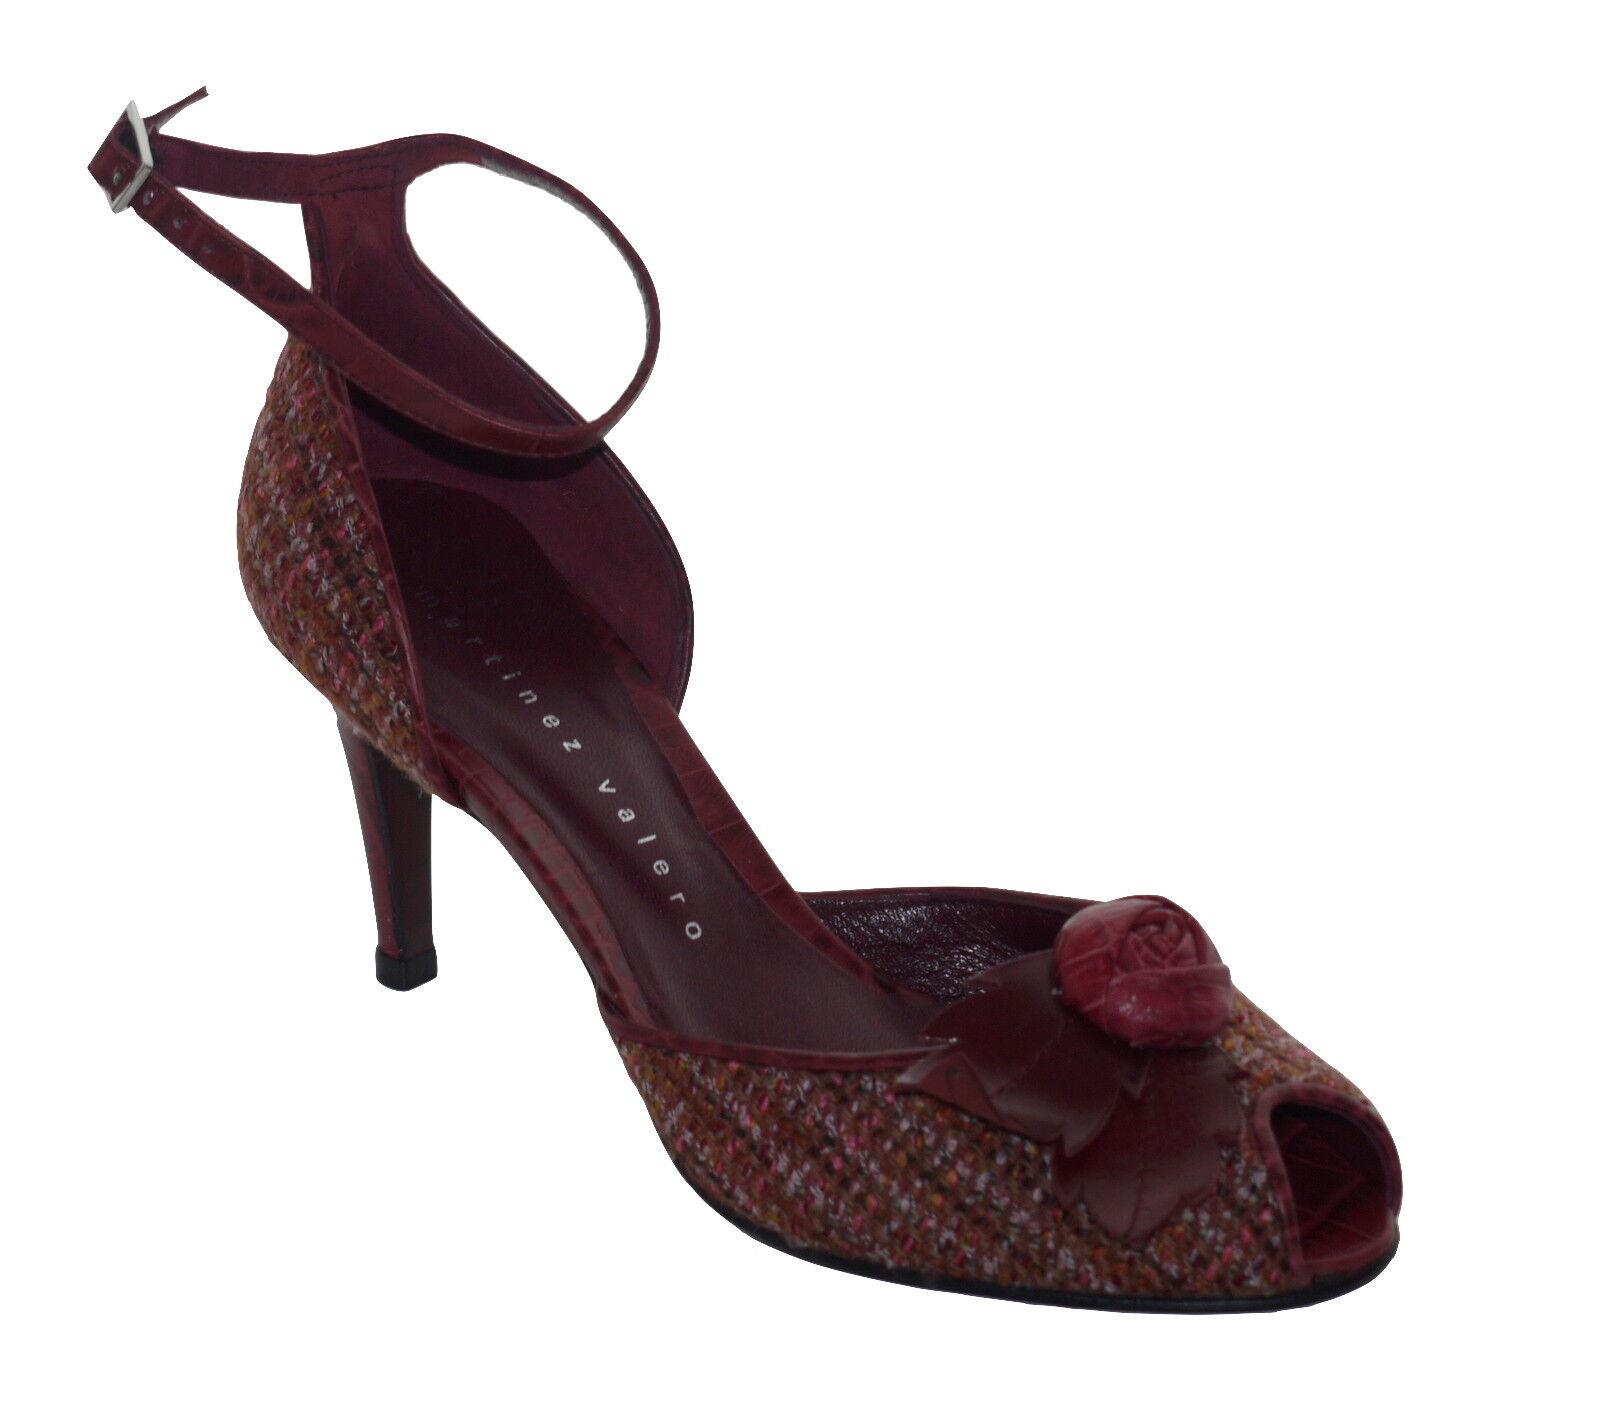 Martinez Toes Valero Cherry Tweed Peep Toes Martinez Shoes NIB SP 11bdc2